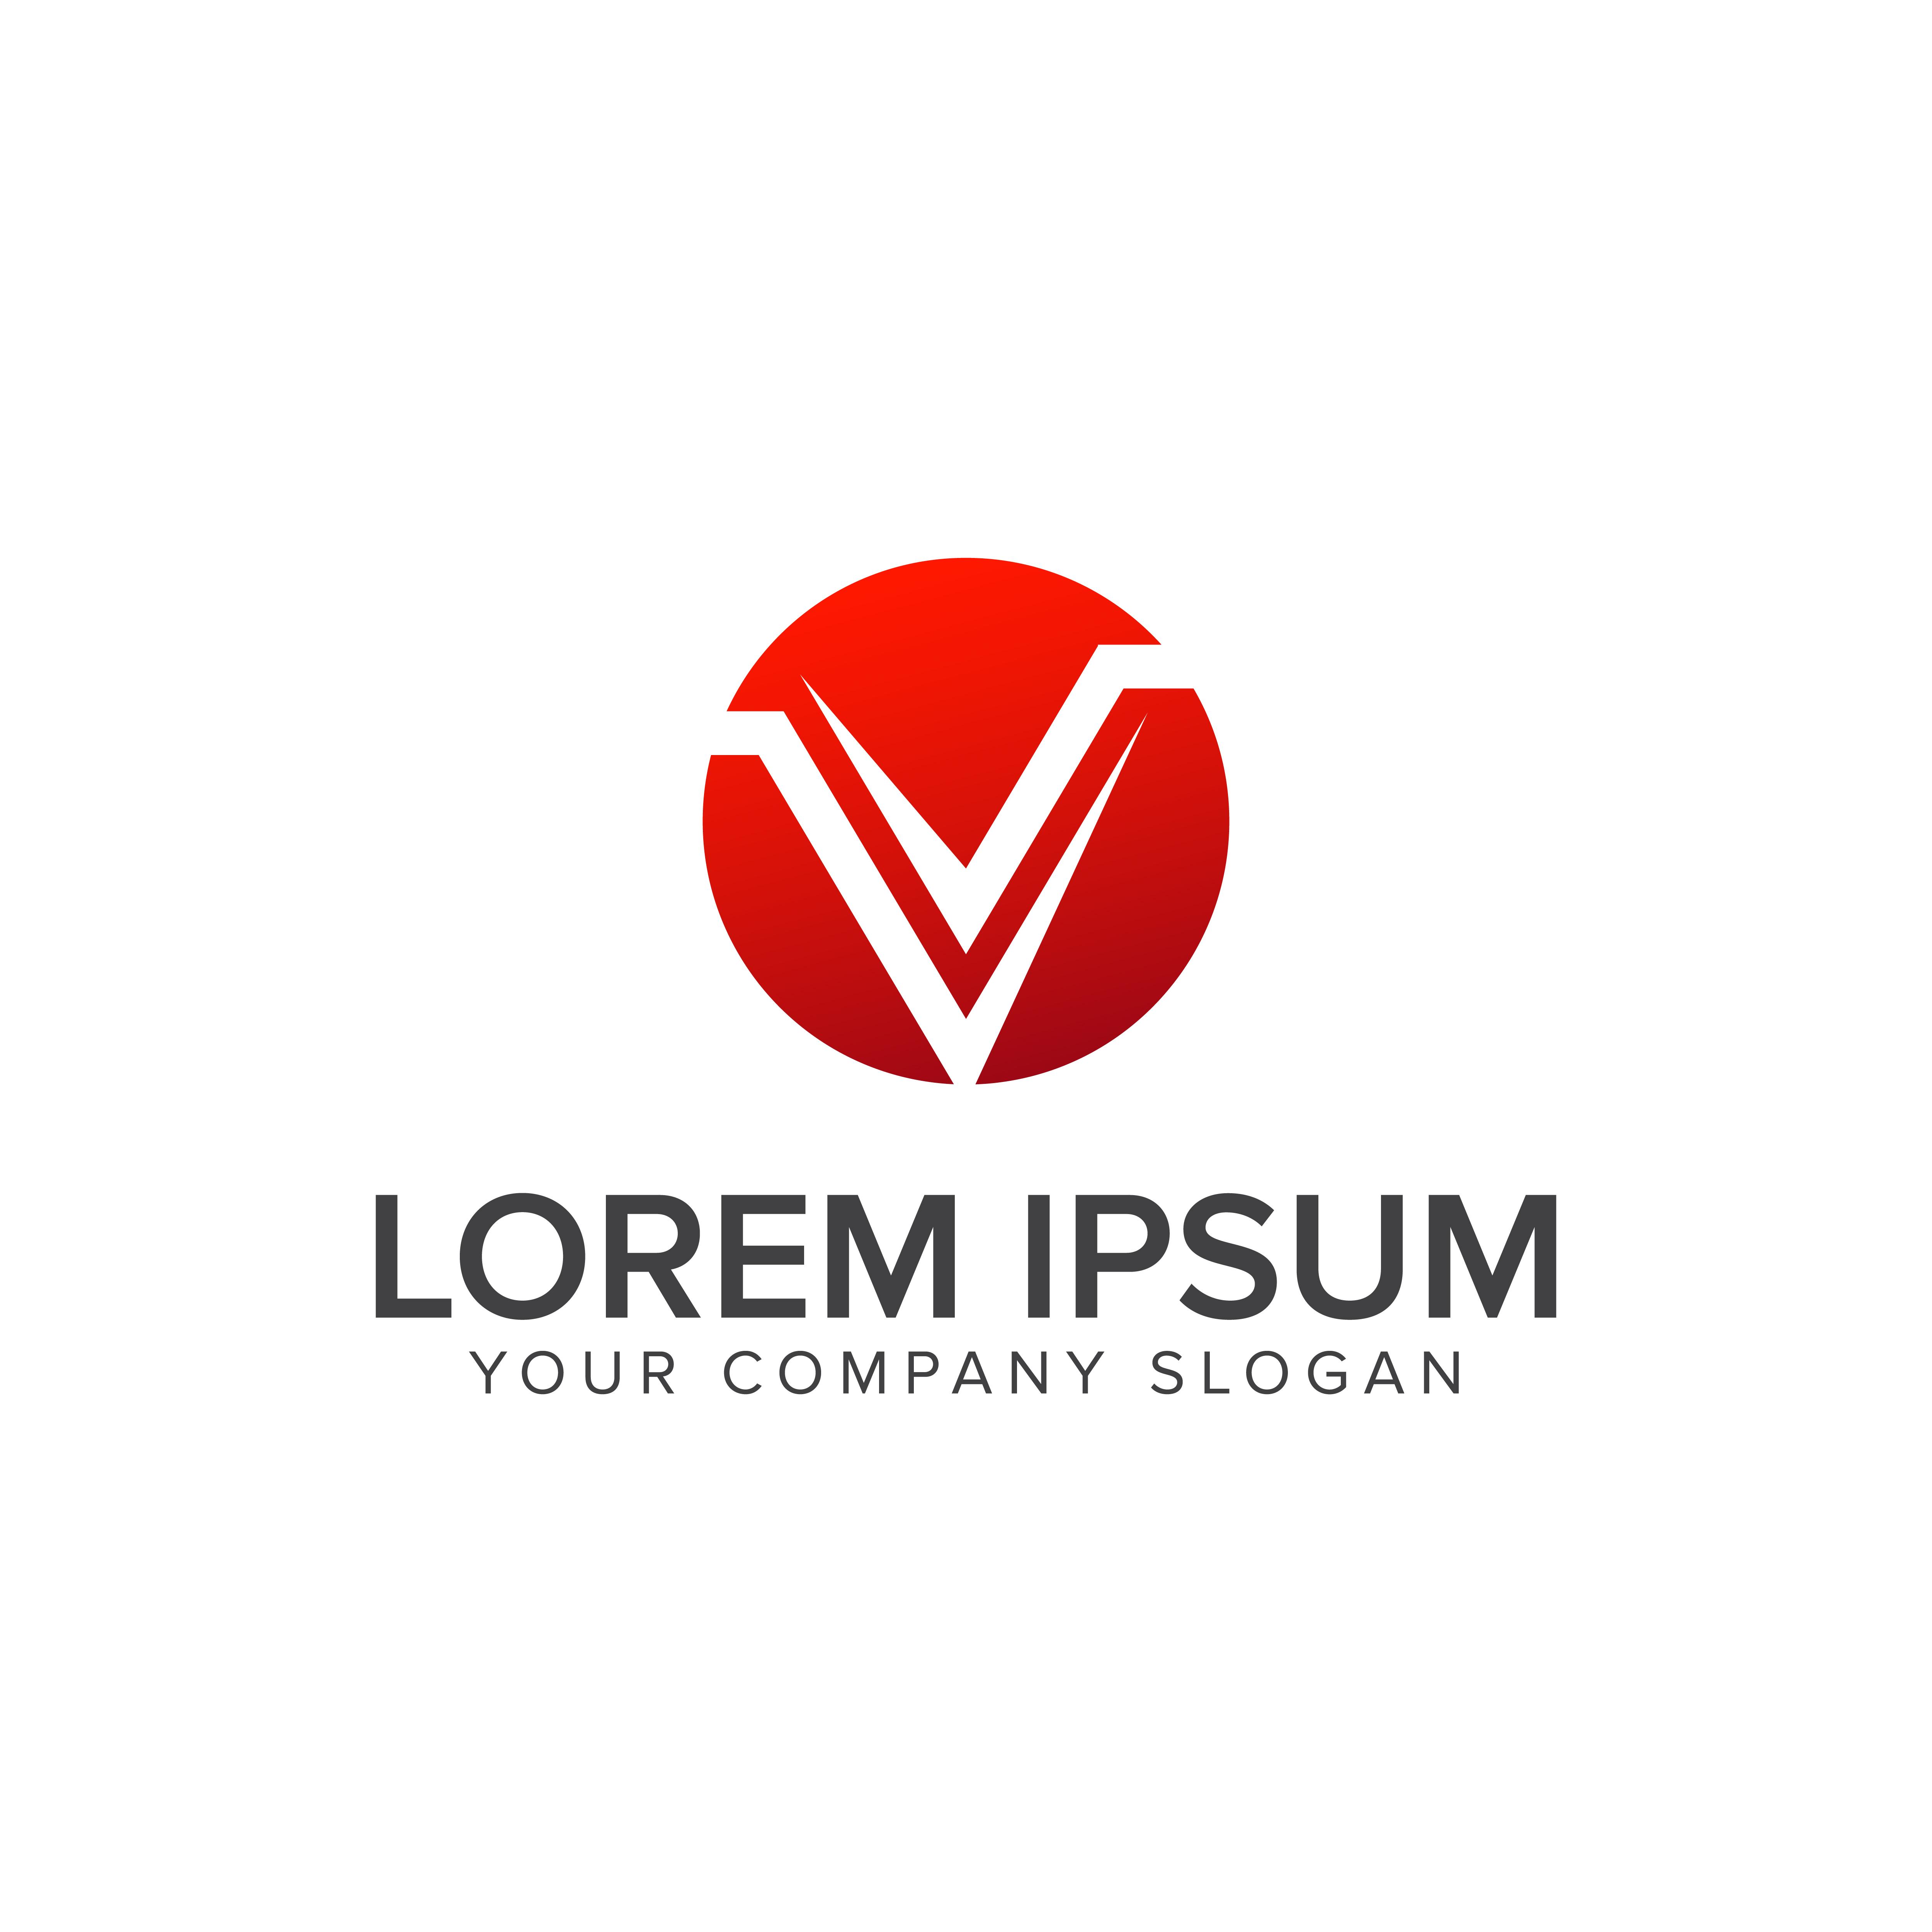 Modern Letter V Logo. Design Concept Template 611095